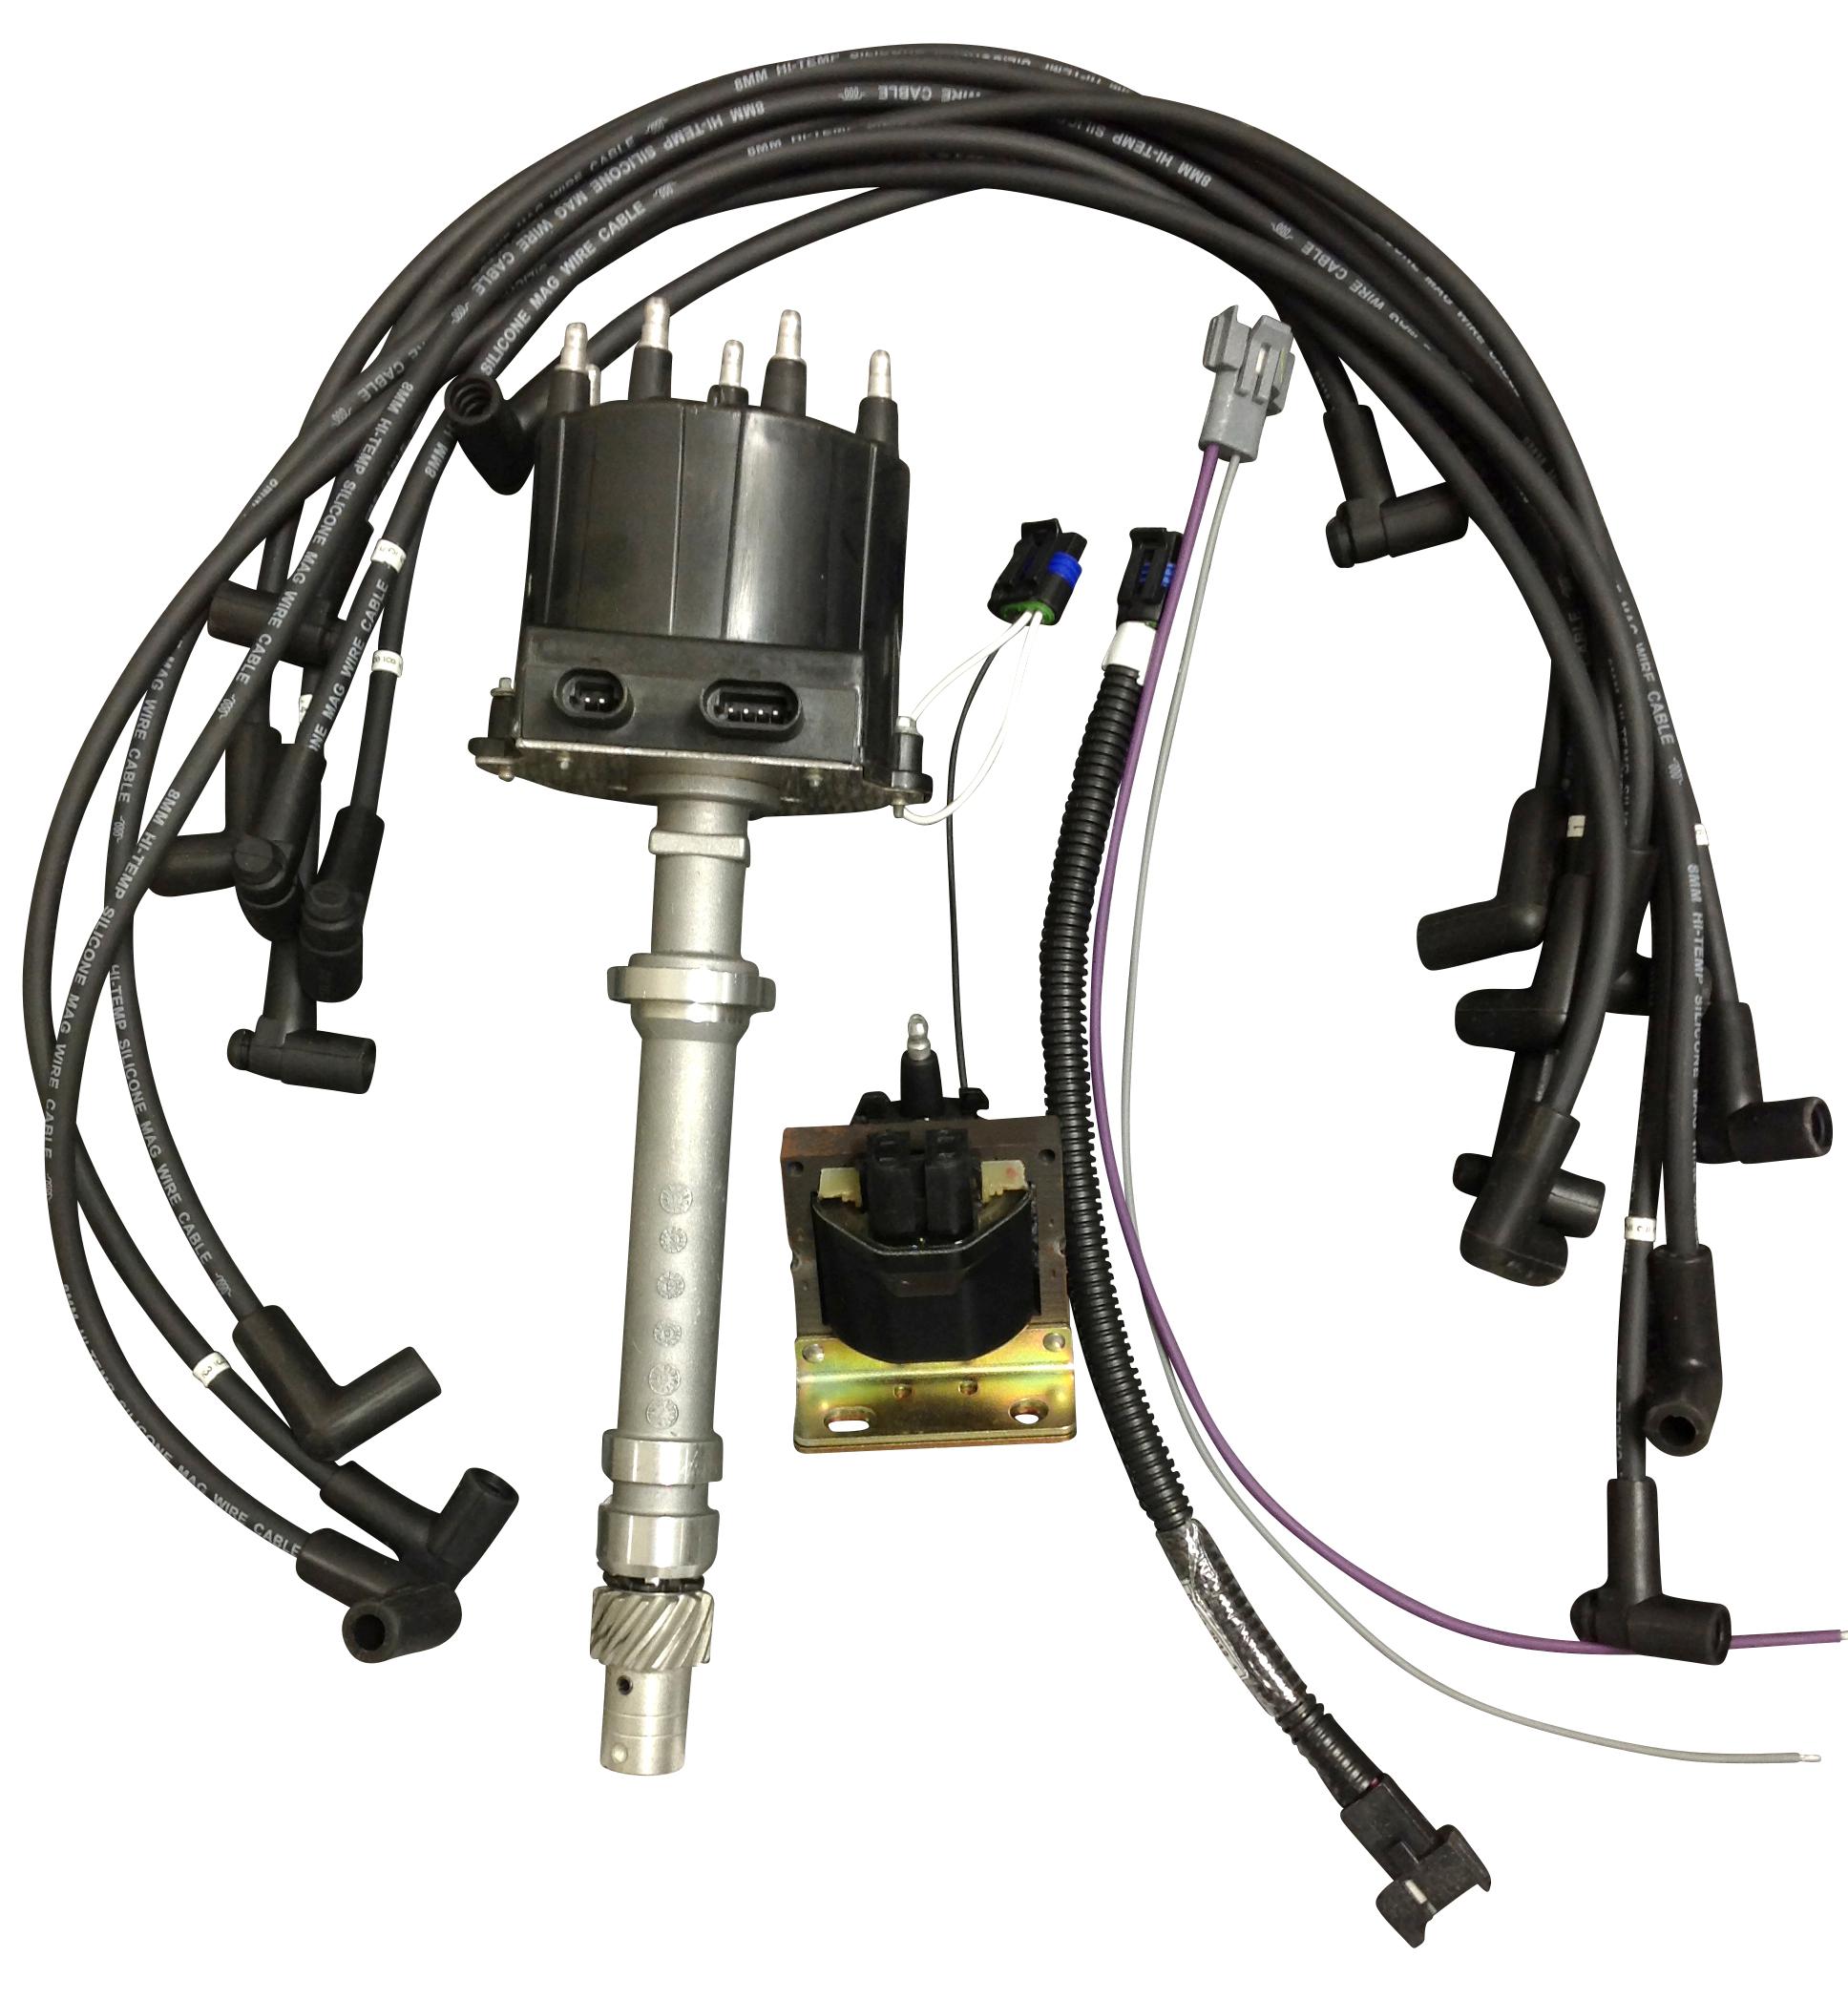 delco remy hei distributor wiring diagram mk4 jetta marineenginedepot